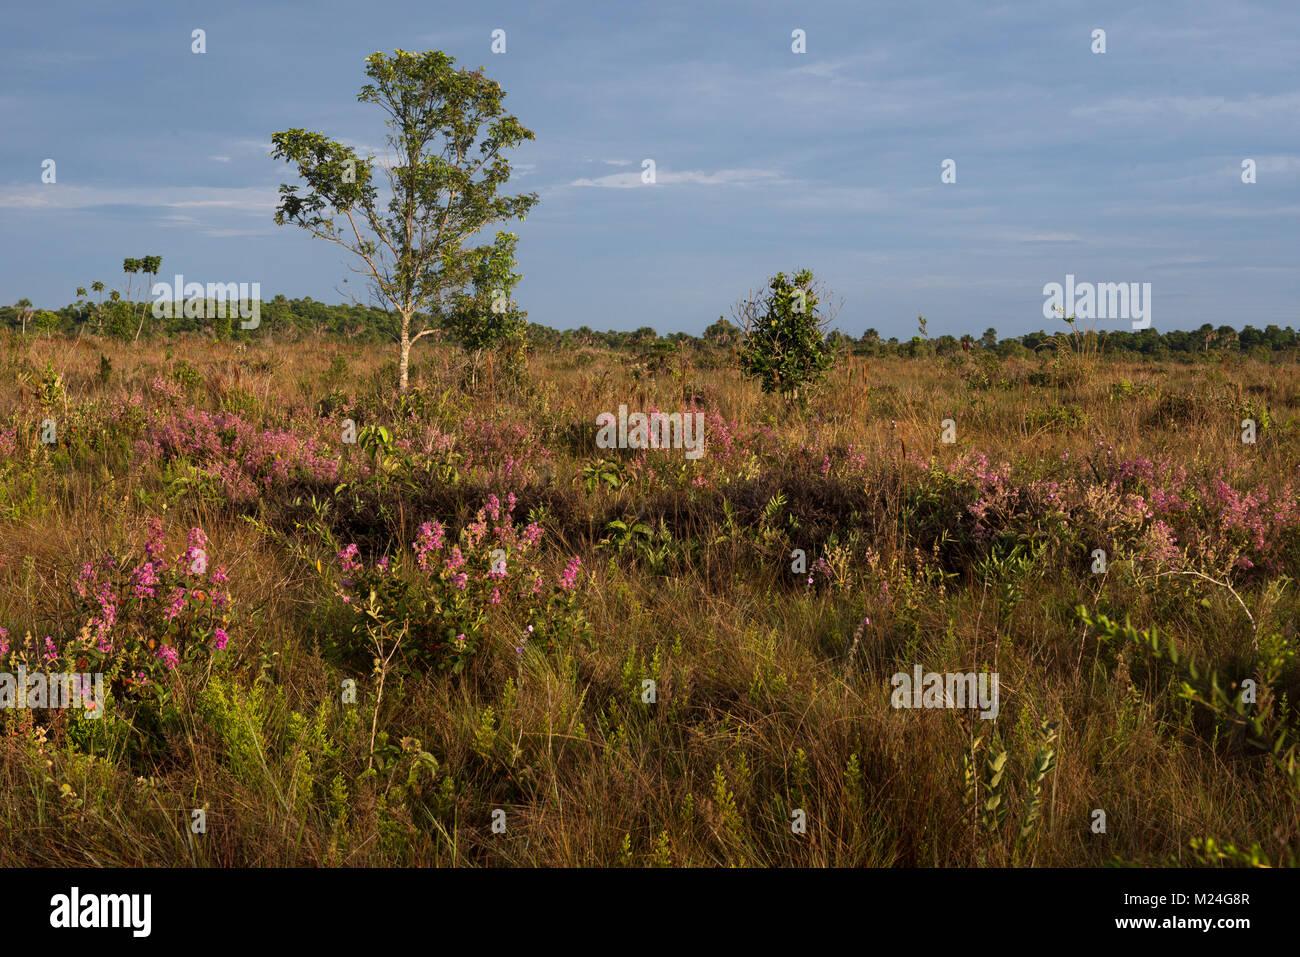 Grassland at Emas National Park, Goiás, Brazil - Stock Image